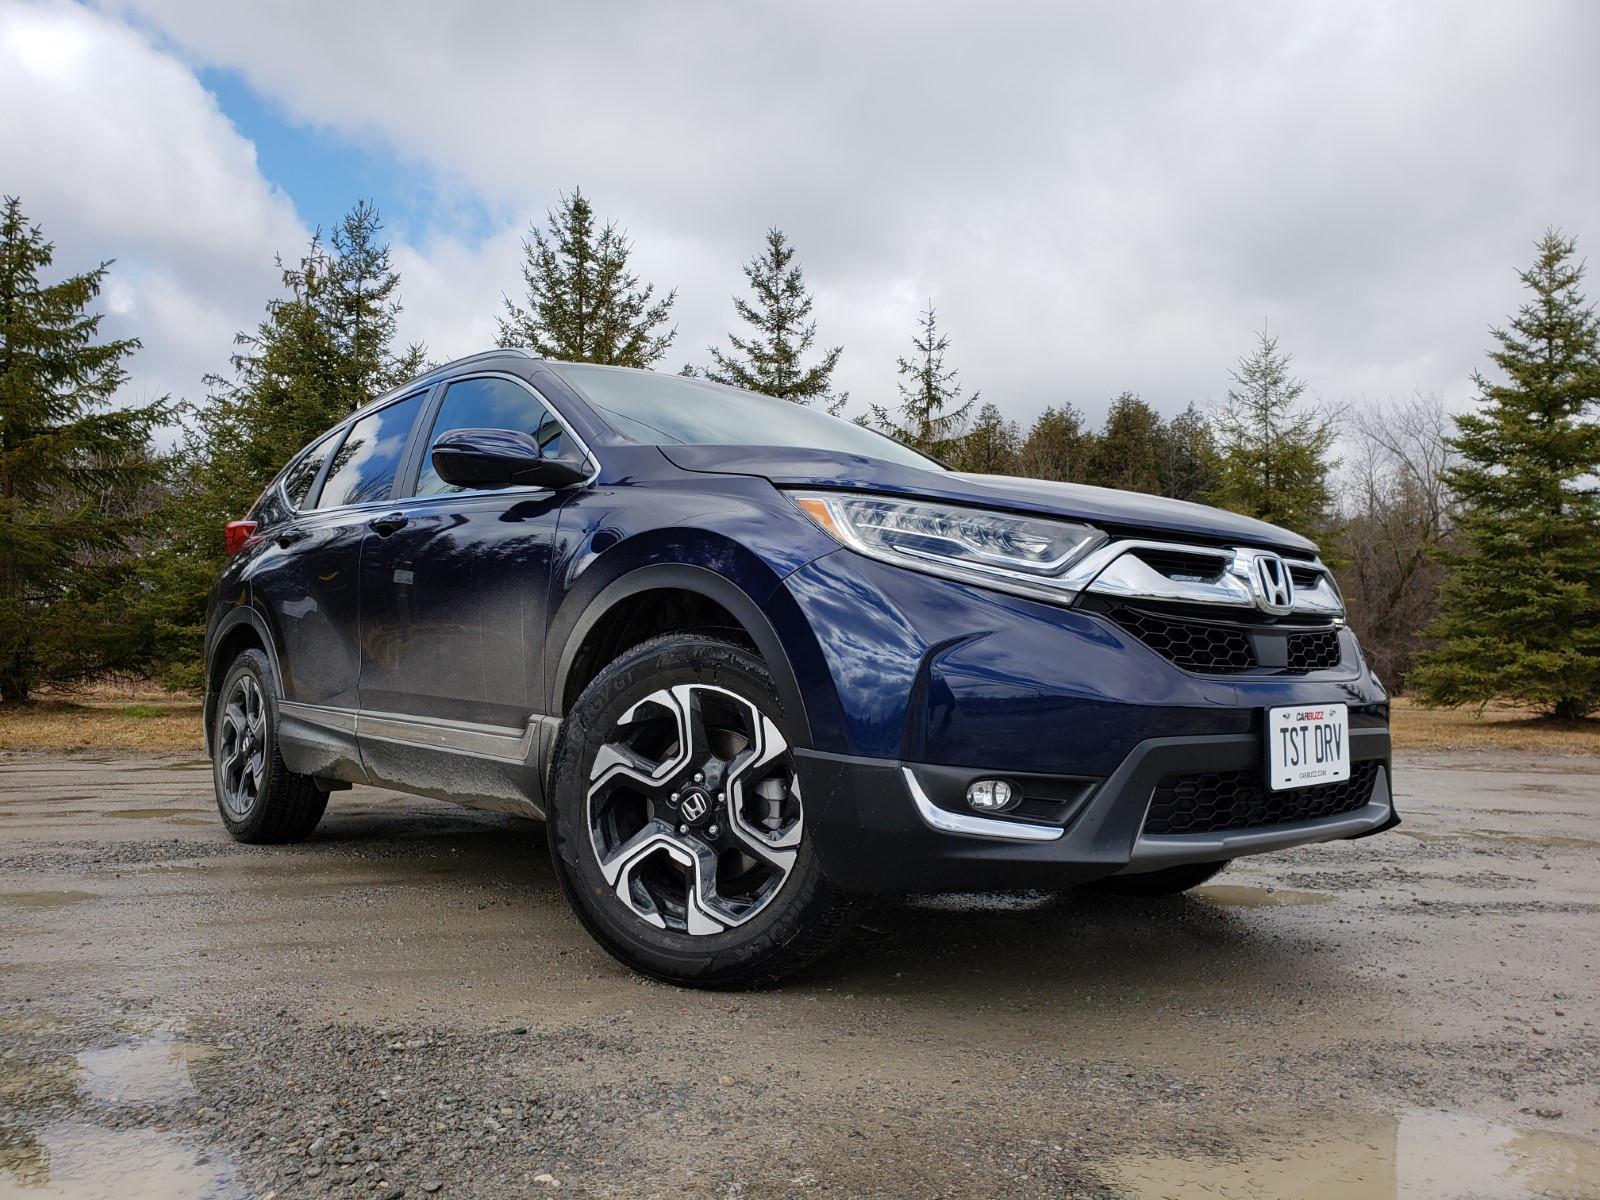 2019 Honda CR-V Test Drive Review: Still The Top Dog?